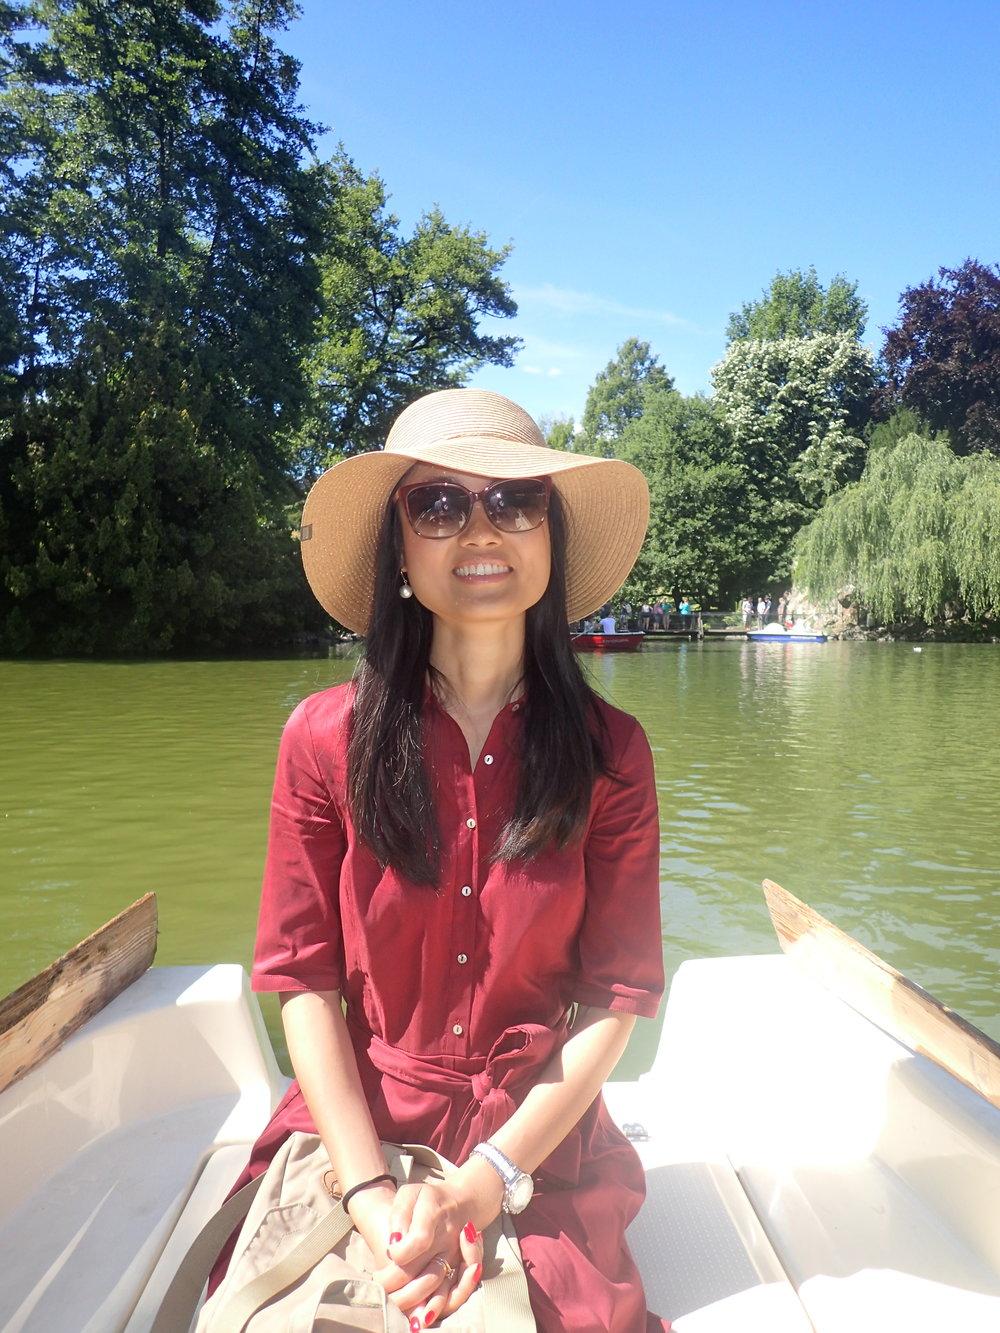 Feibai on a row on the small lake in Palmengarten Frankfurt